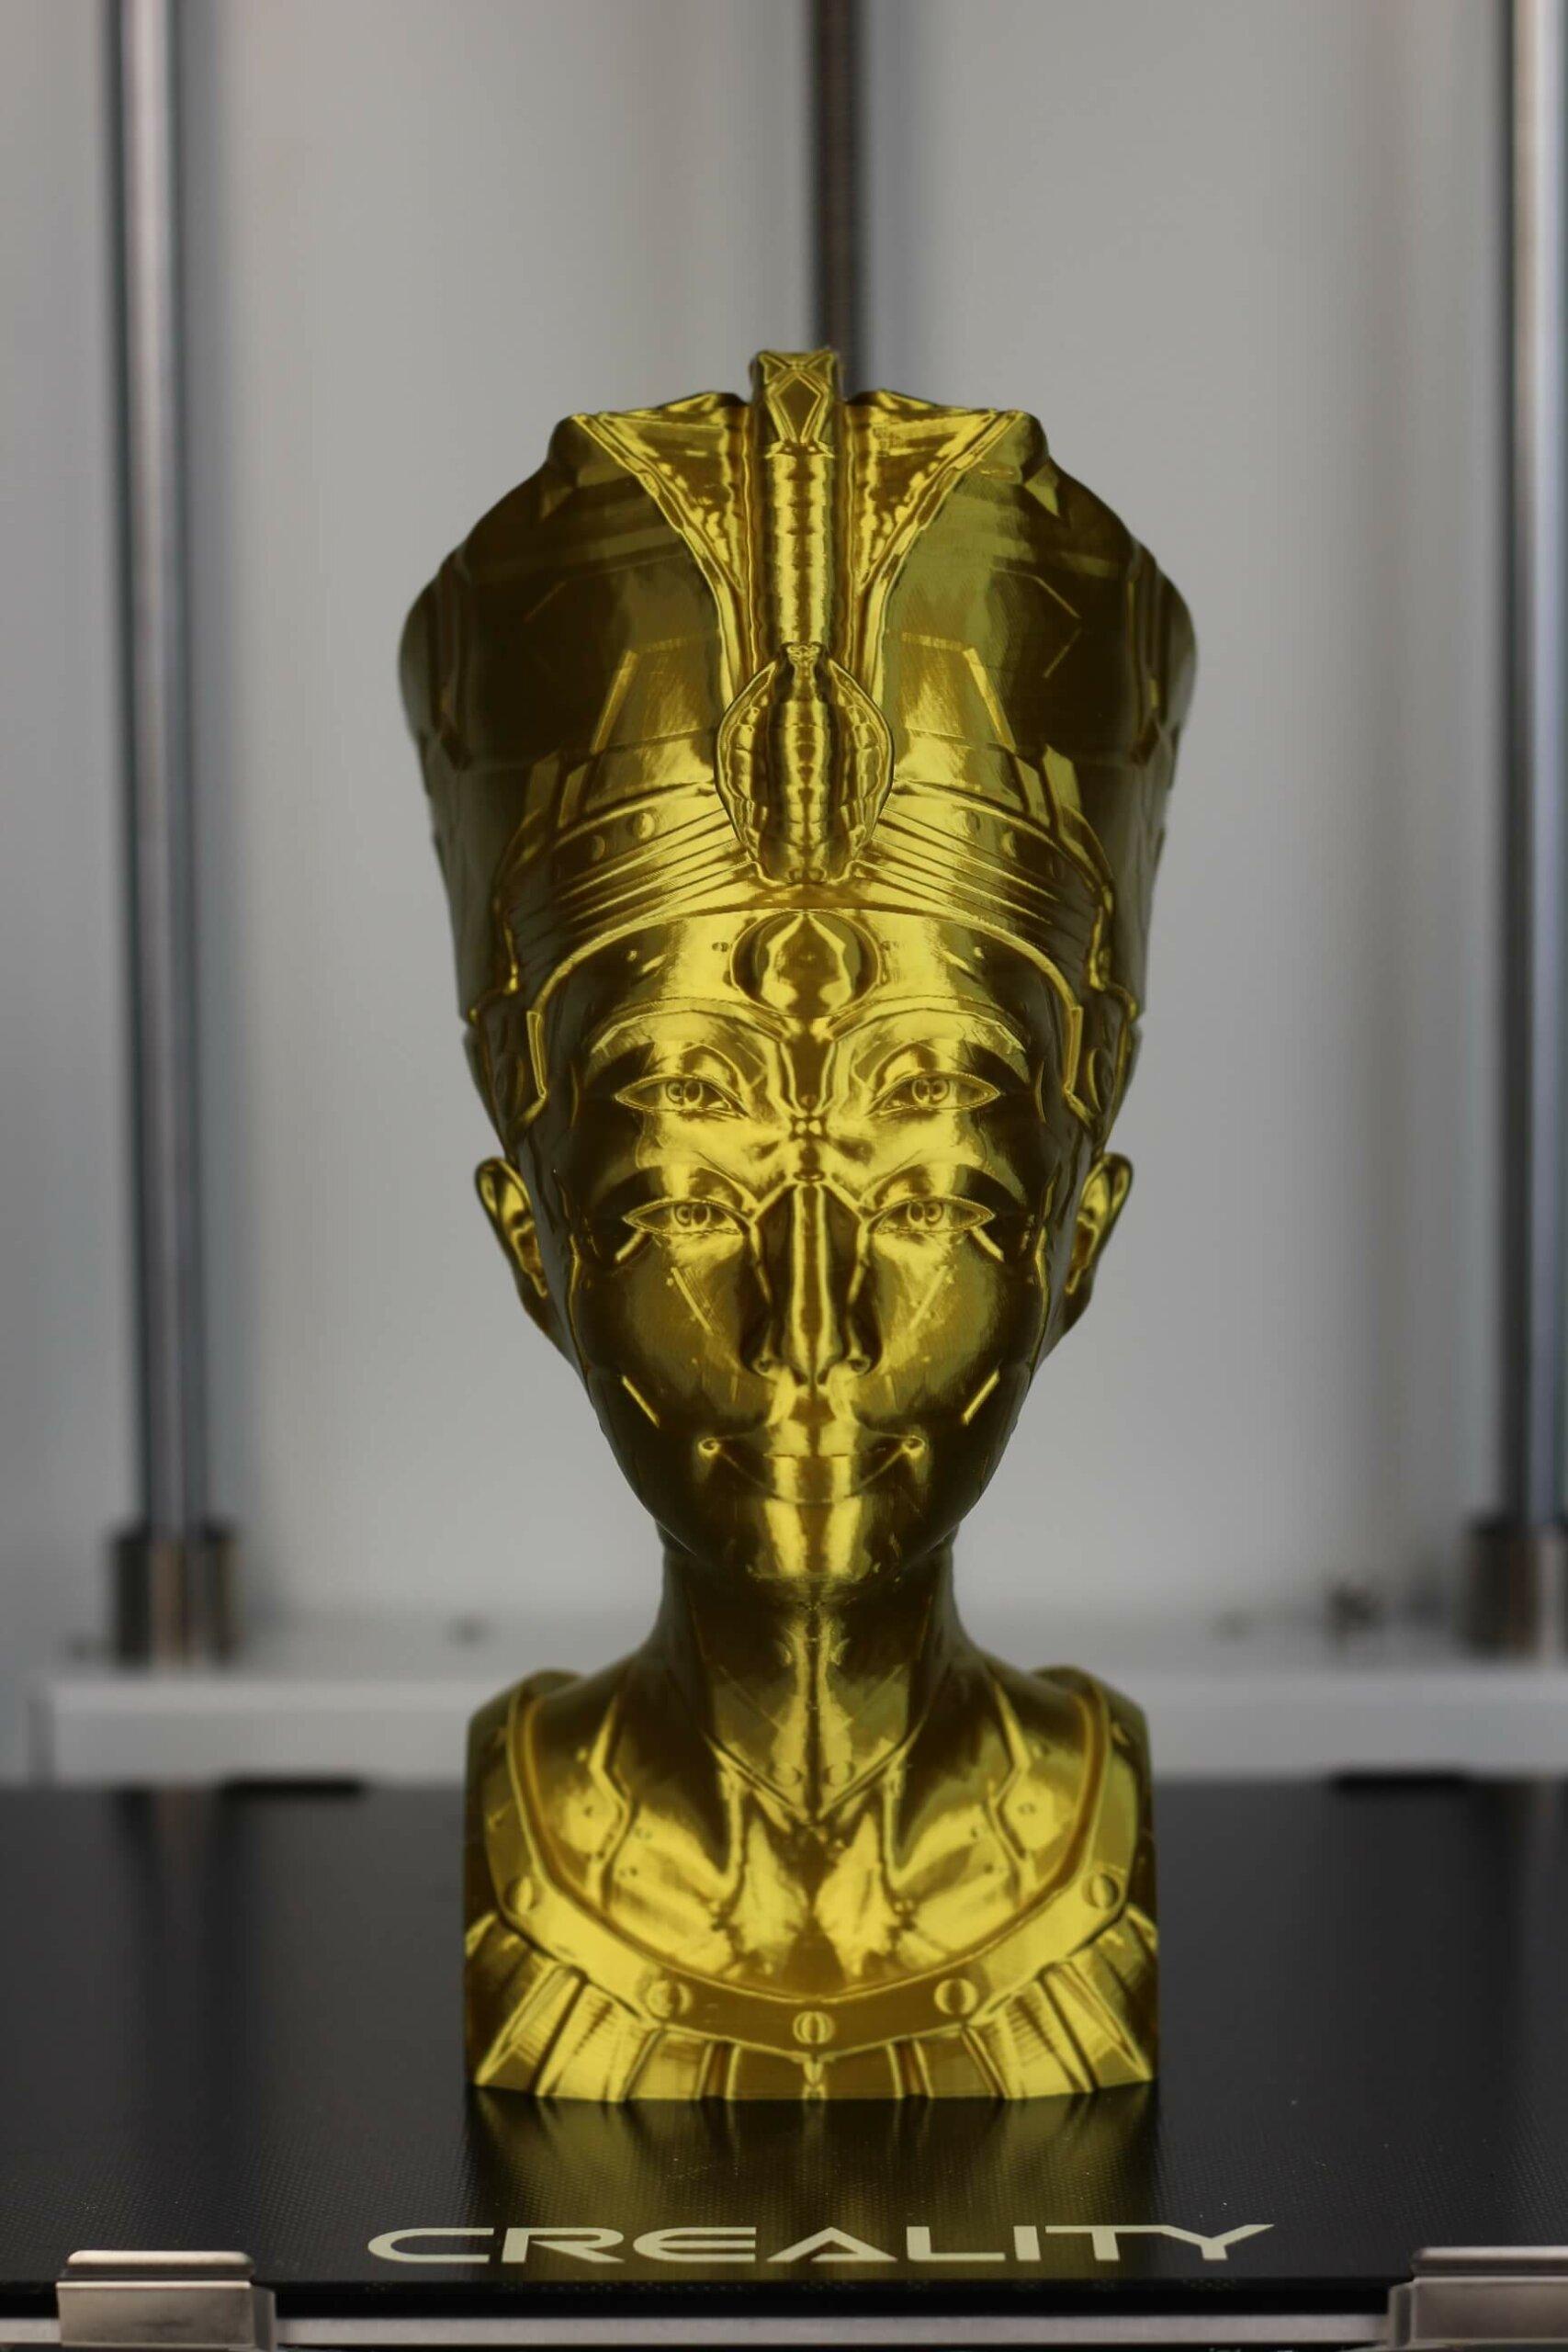 Technotiti 4 scaled | 3D Printing Tips to Improve Print Quality